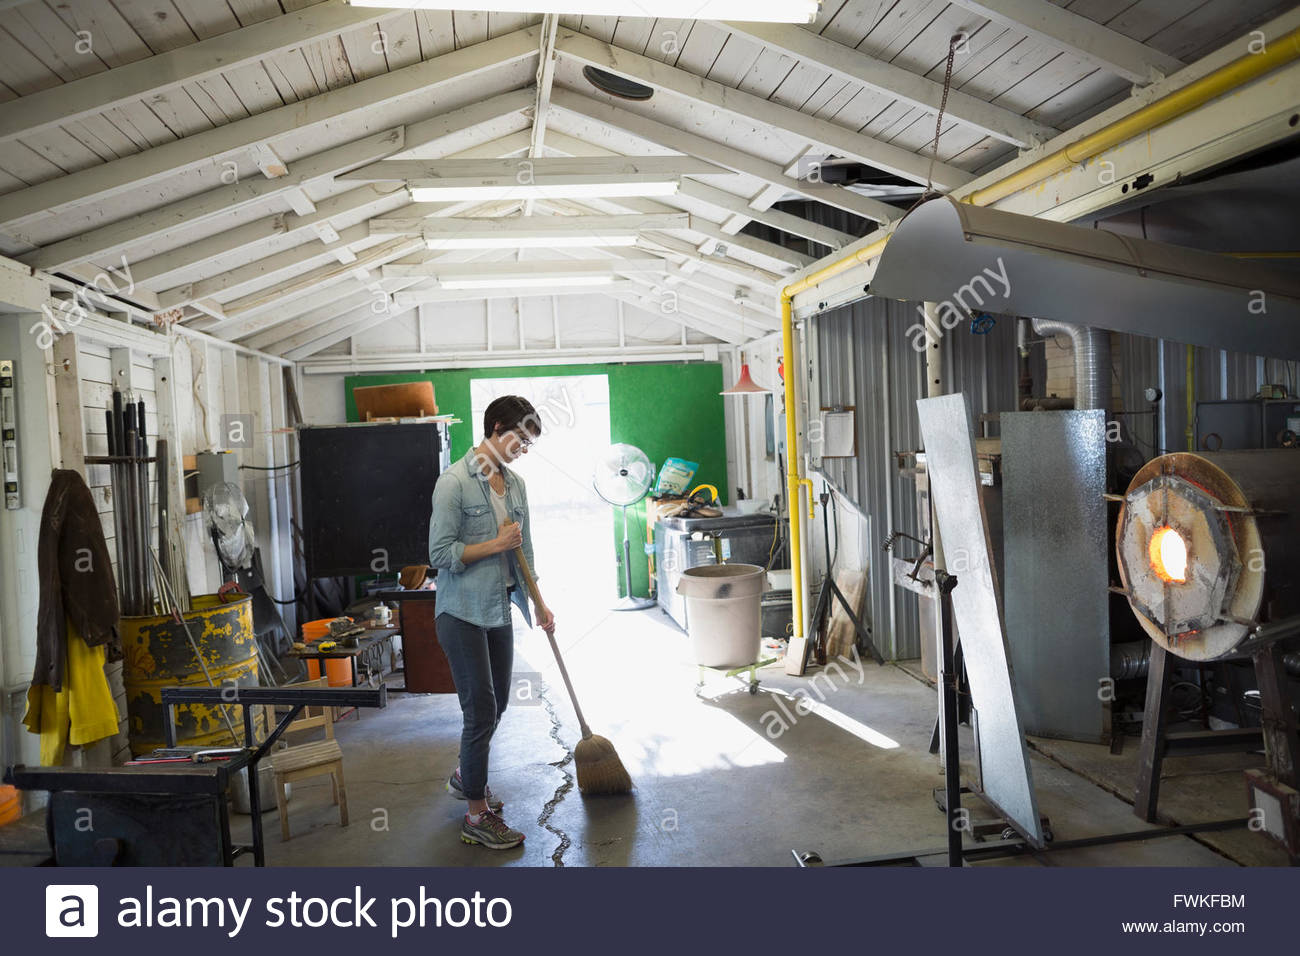 Hembra glassblower barriendo en el taller Imagen De Stock